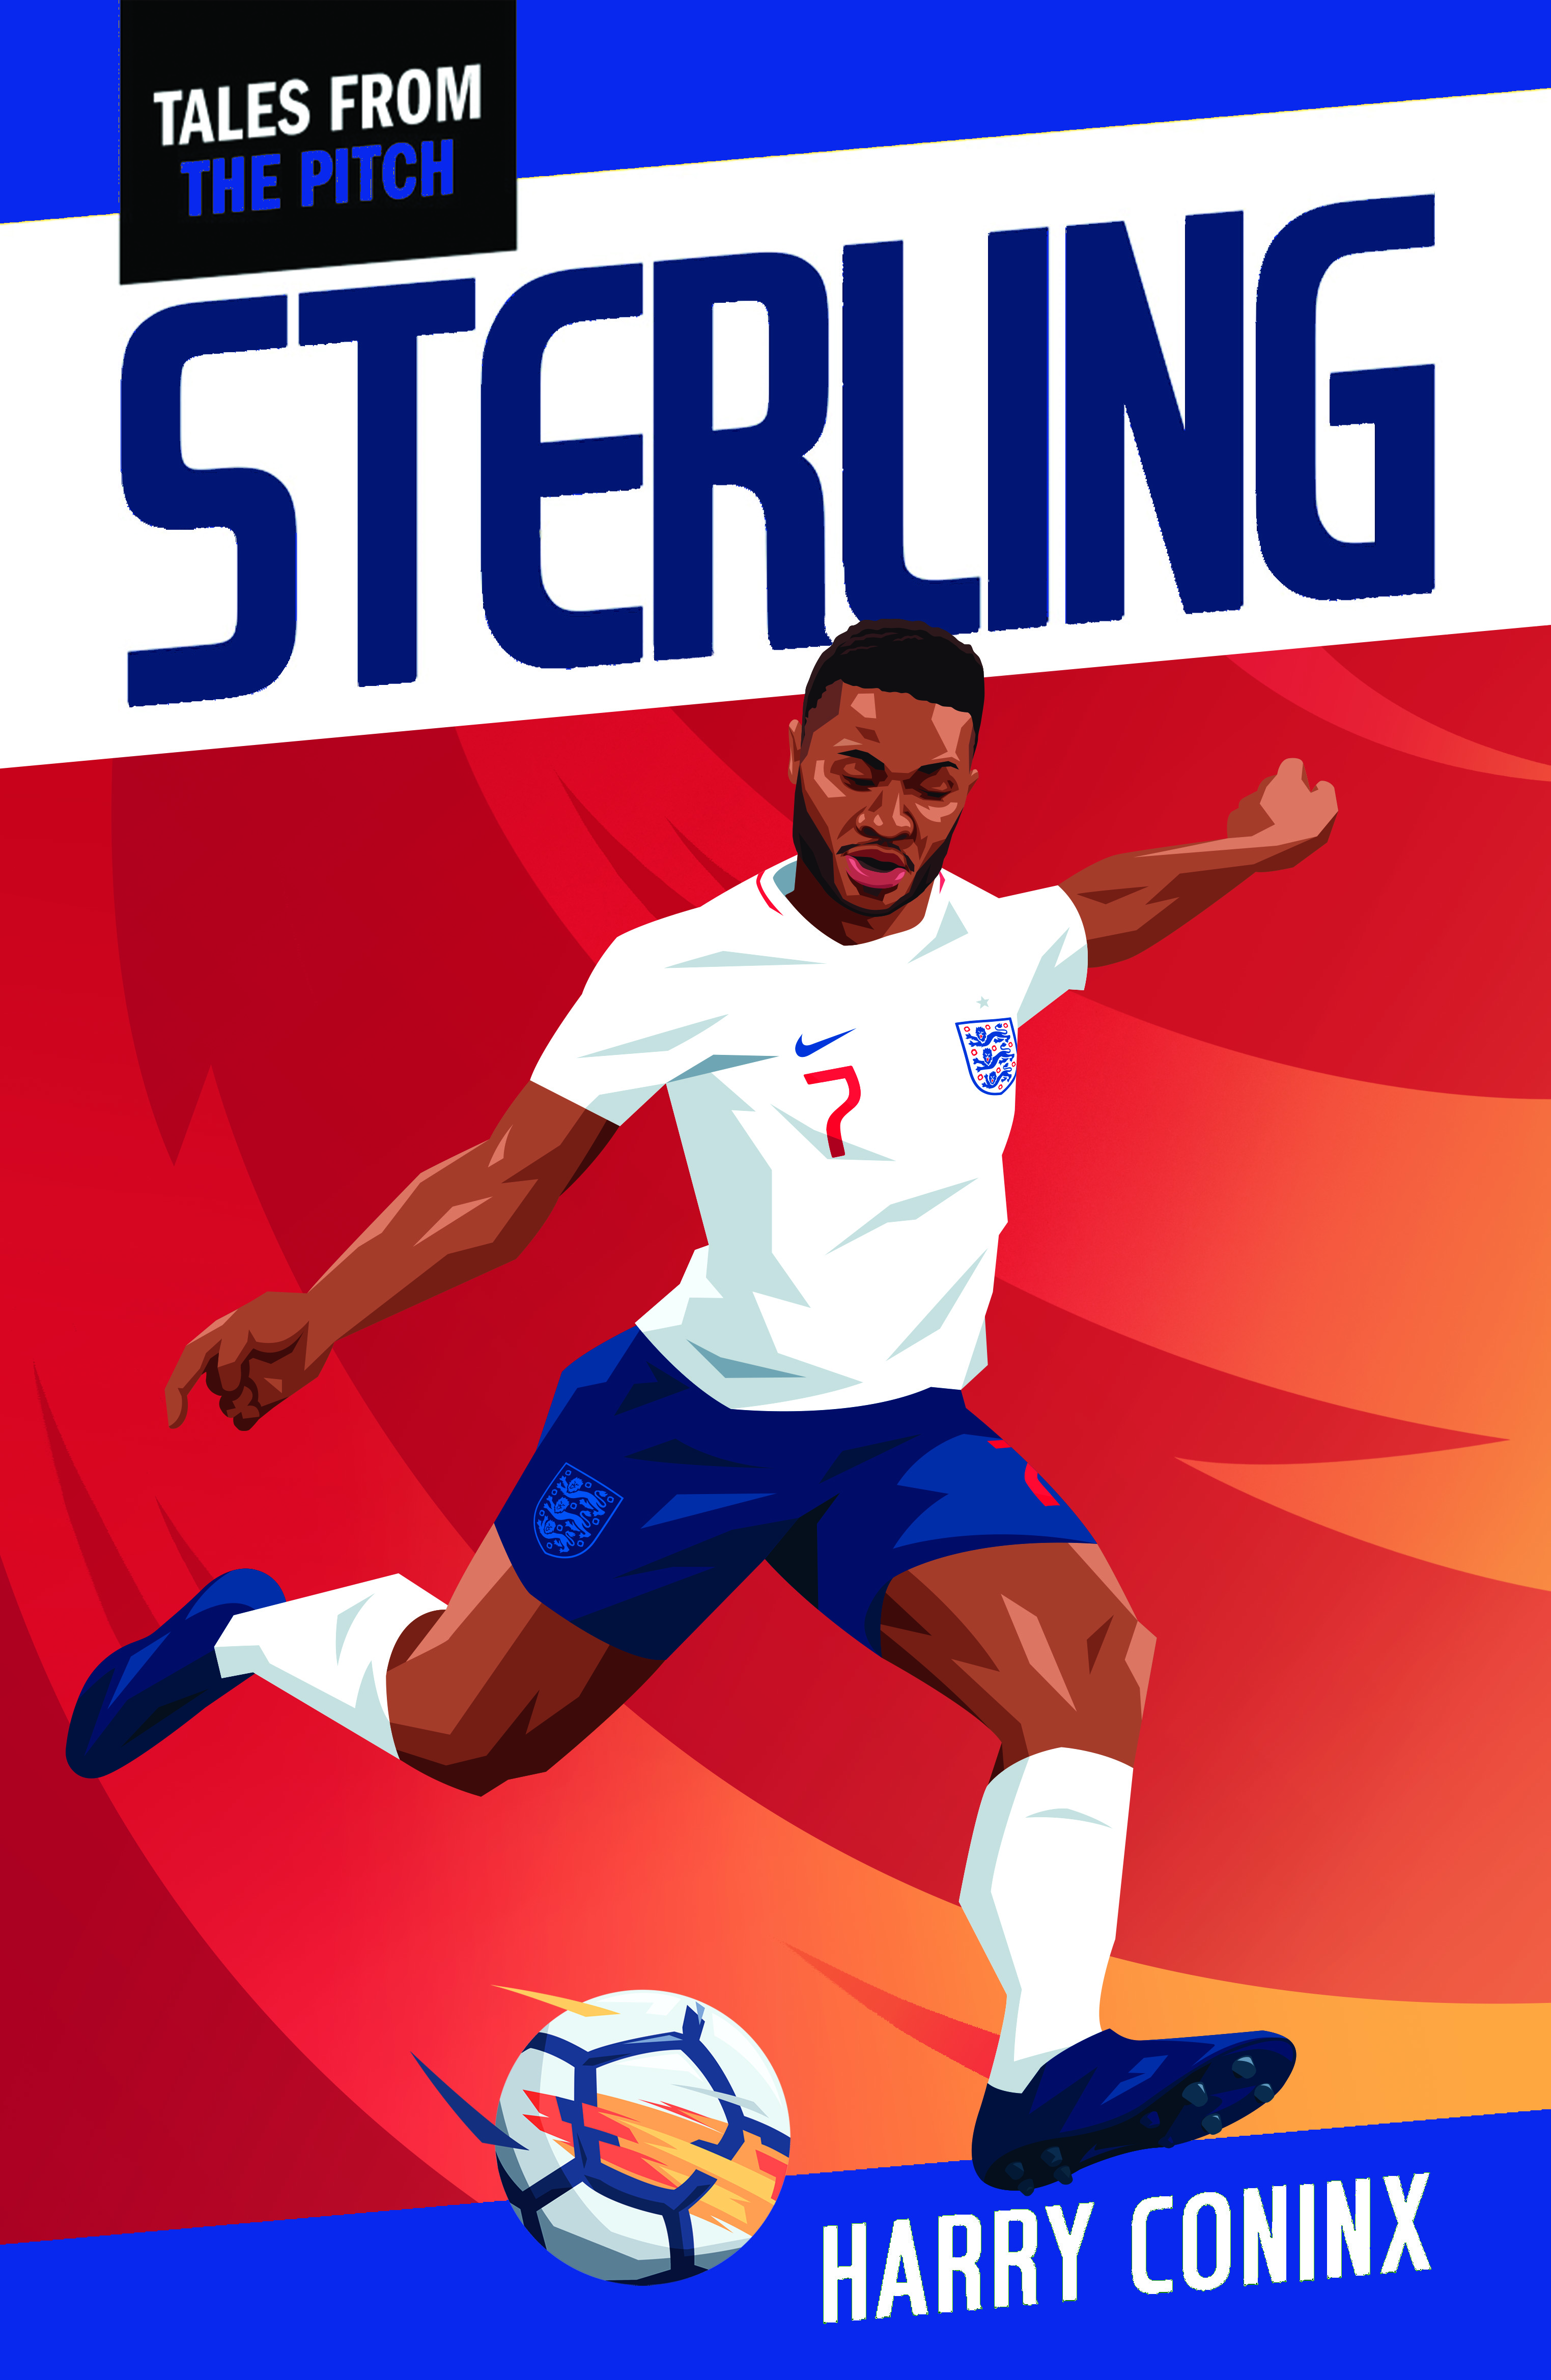 SterlingFinal_new